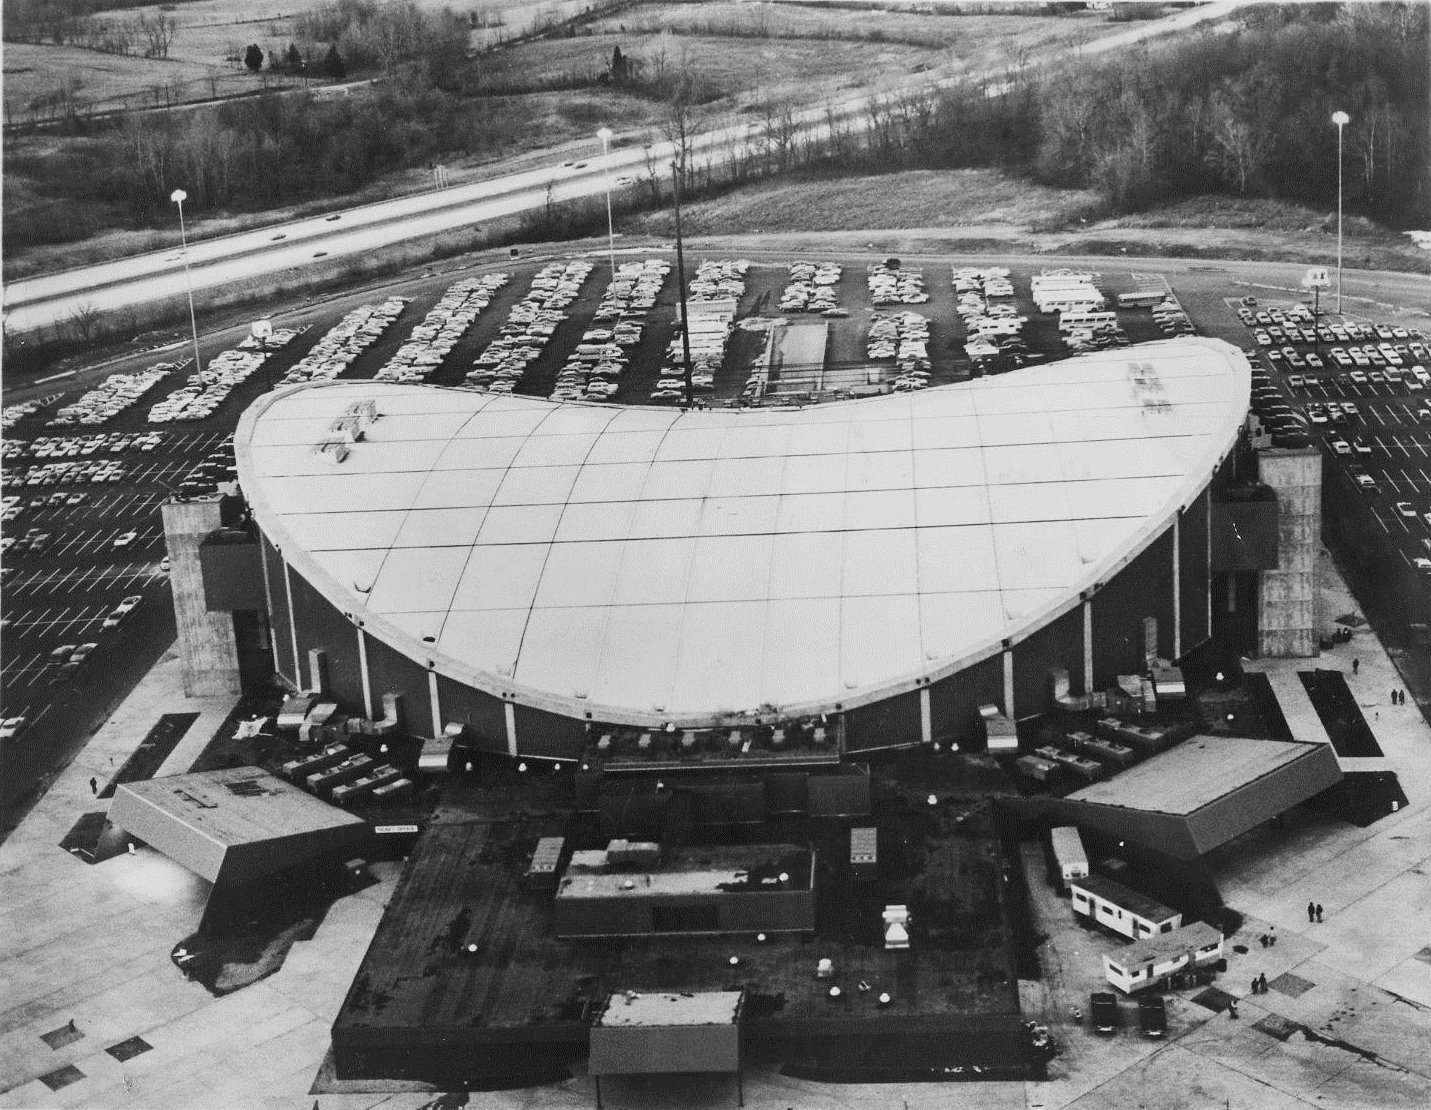 Capital Md Centre 1975 Landover